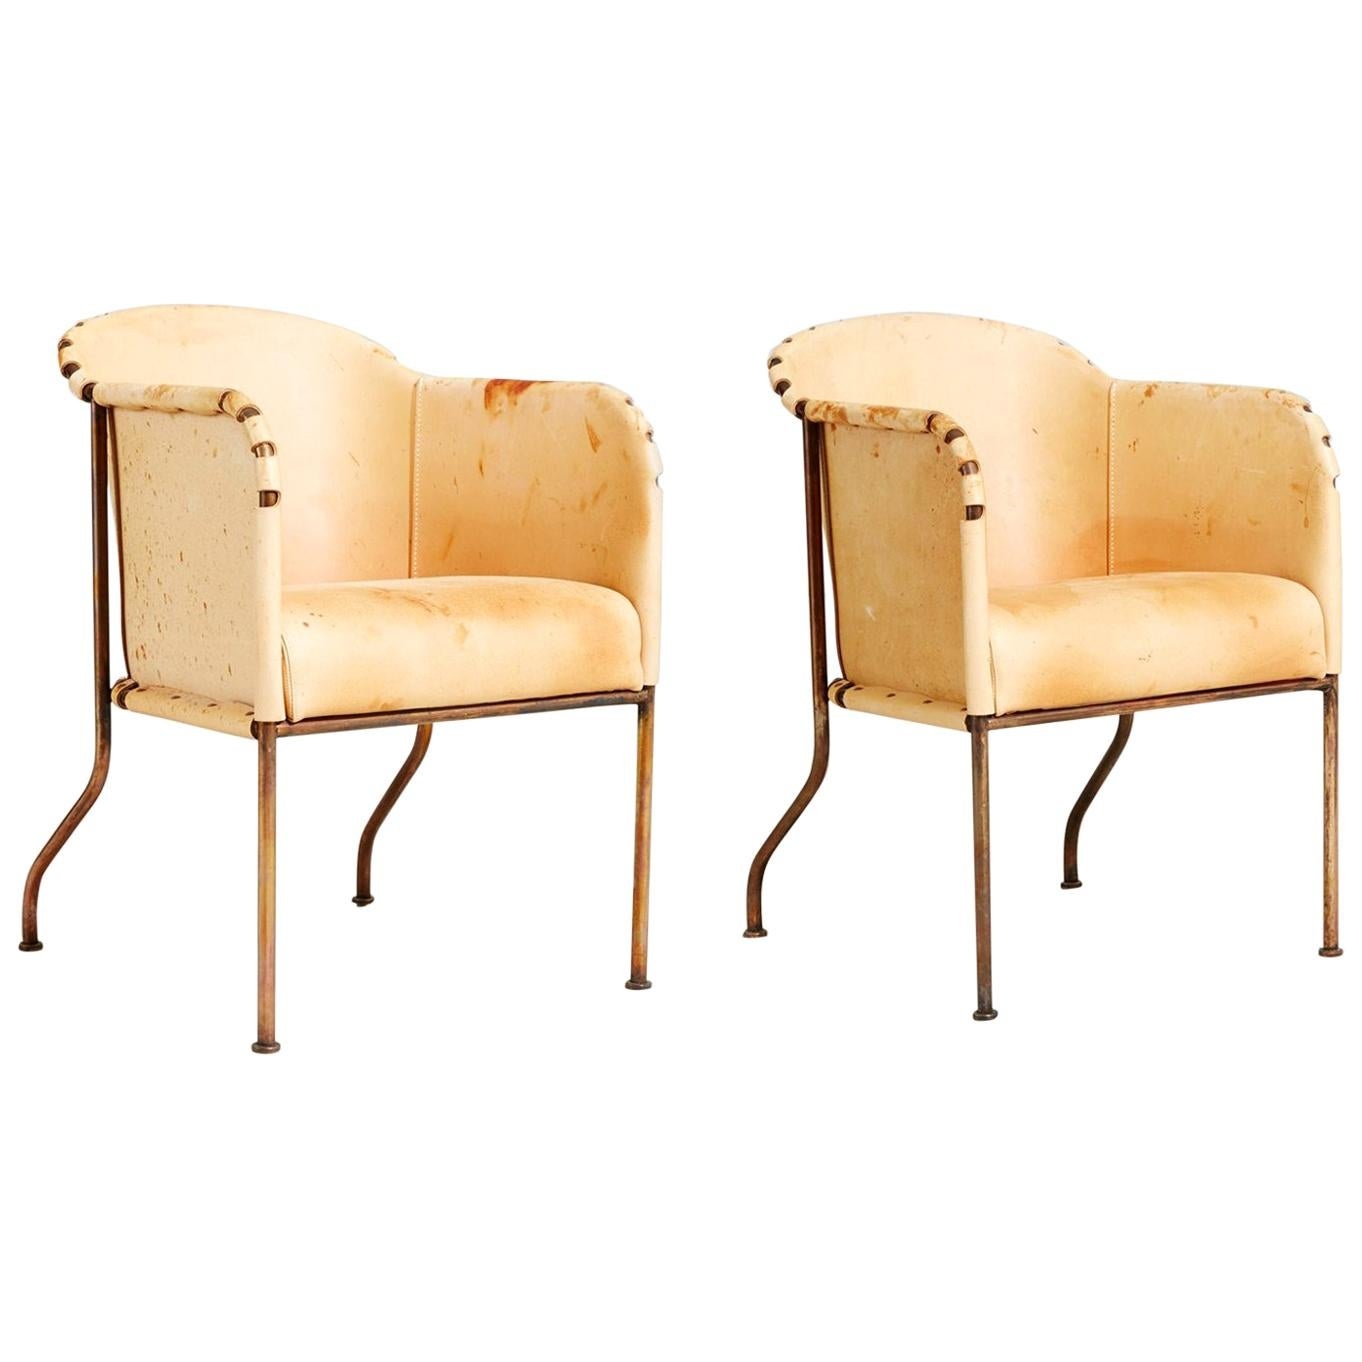 Mats Theselius 'Ambassad' Armchairs for Källemo Sweden, Set of 2